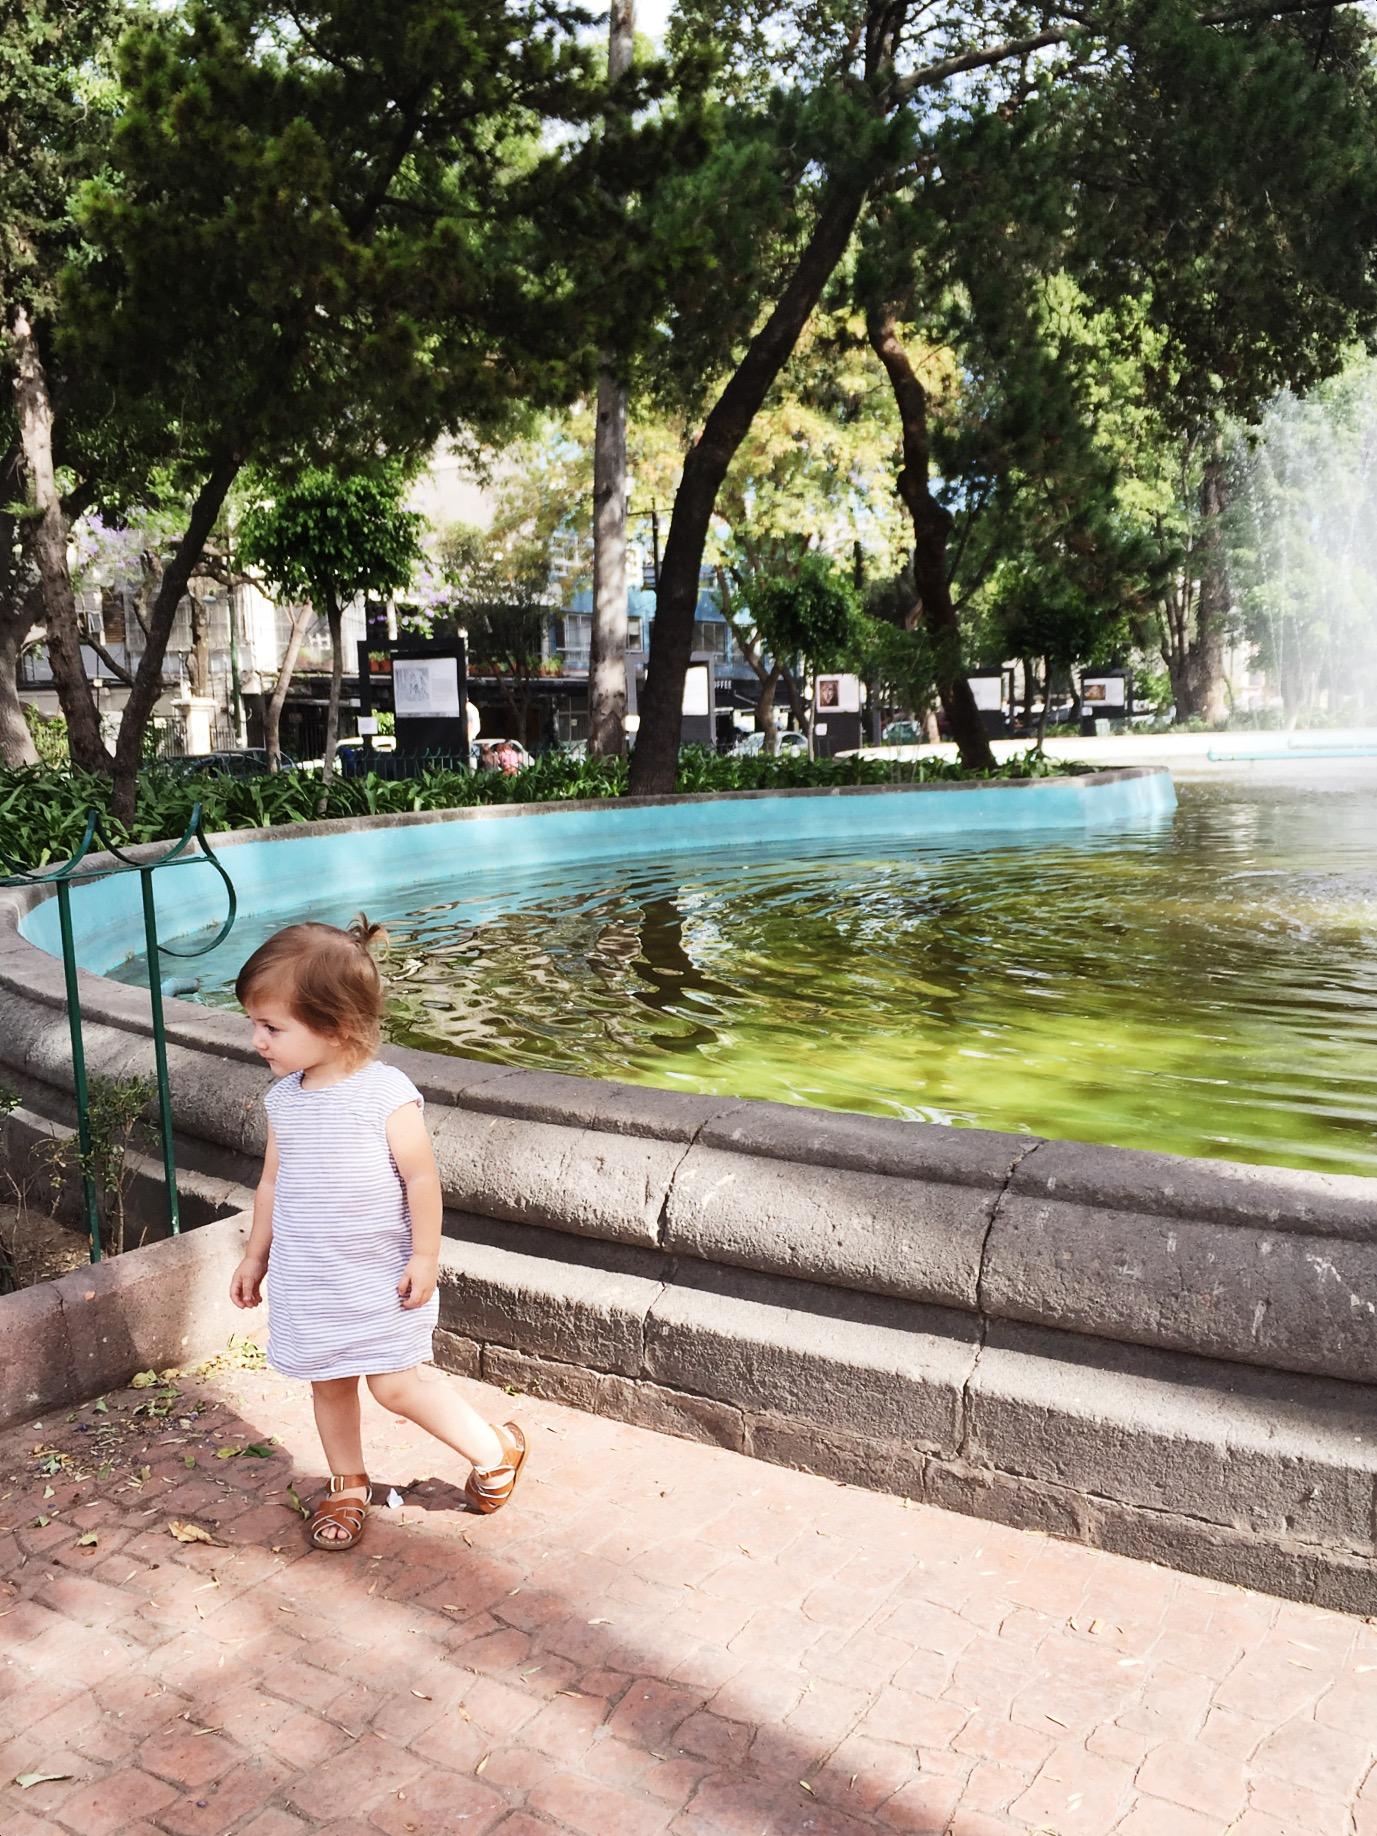 Colonia Roma park